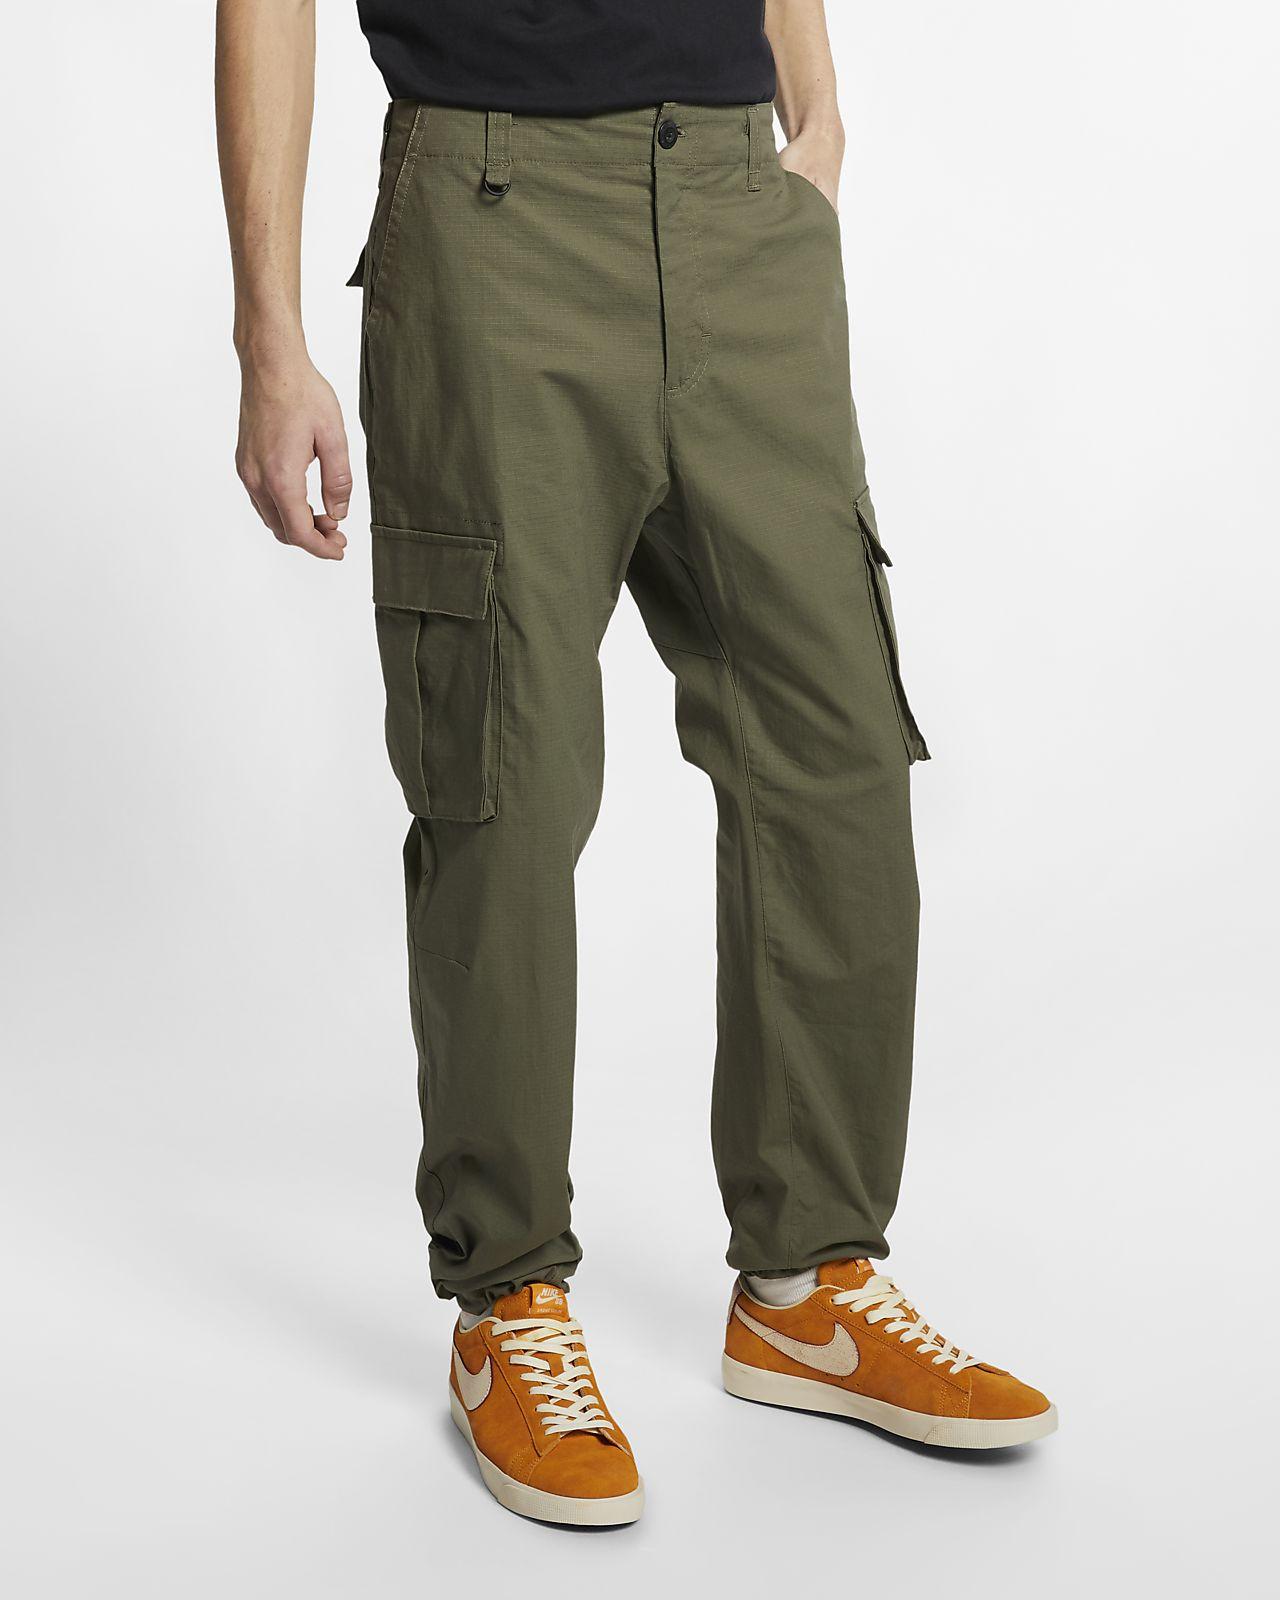 dc54890dd1 Nike SB Flex FTM Men's Skate Cargo Pants. Nike.com